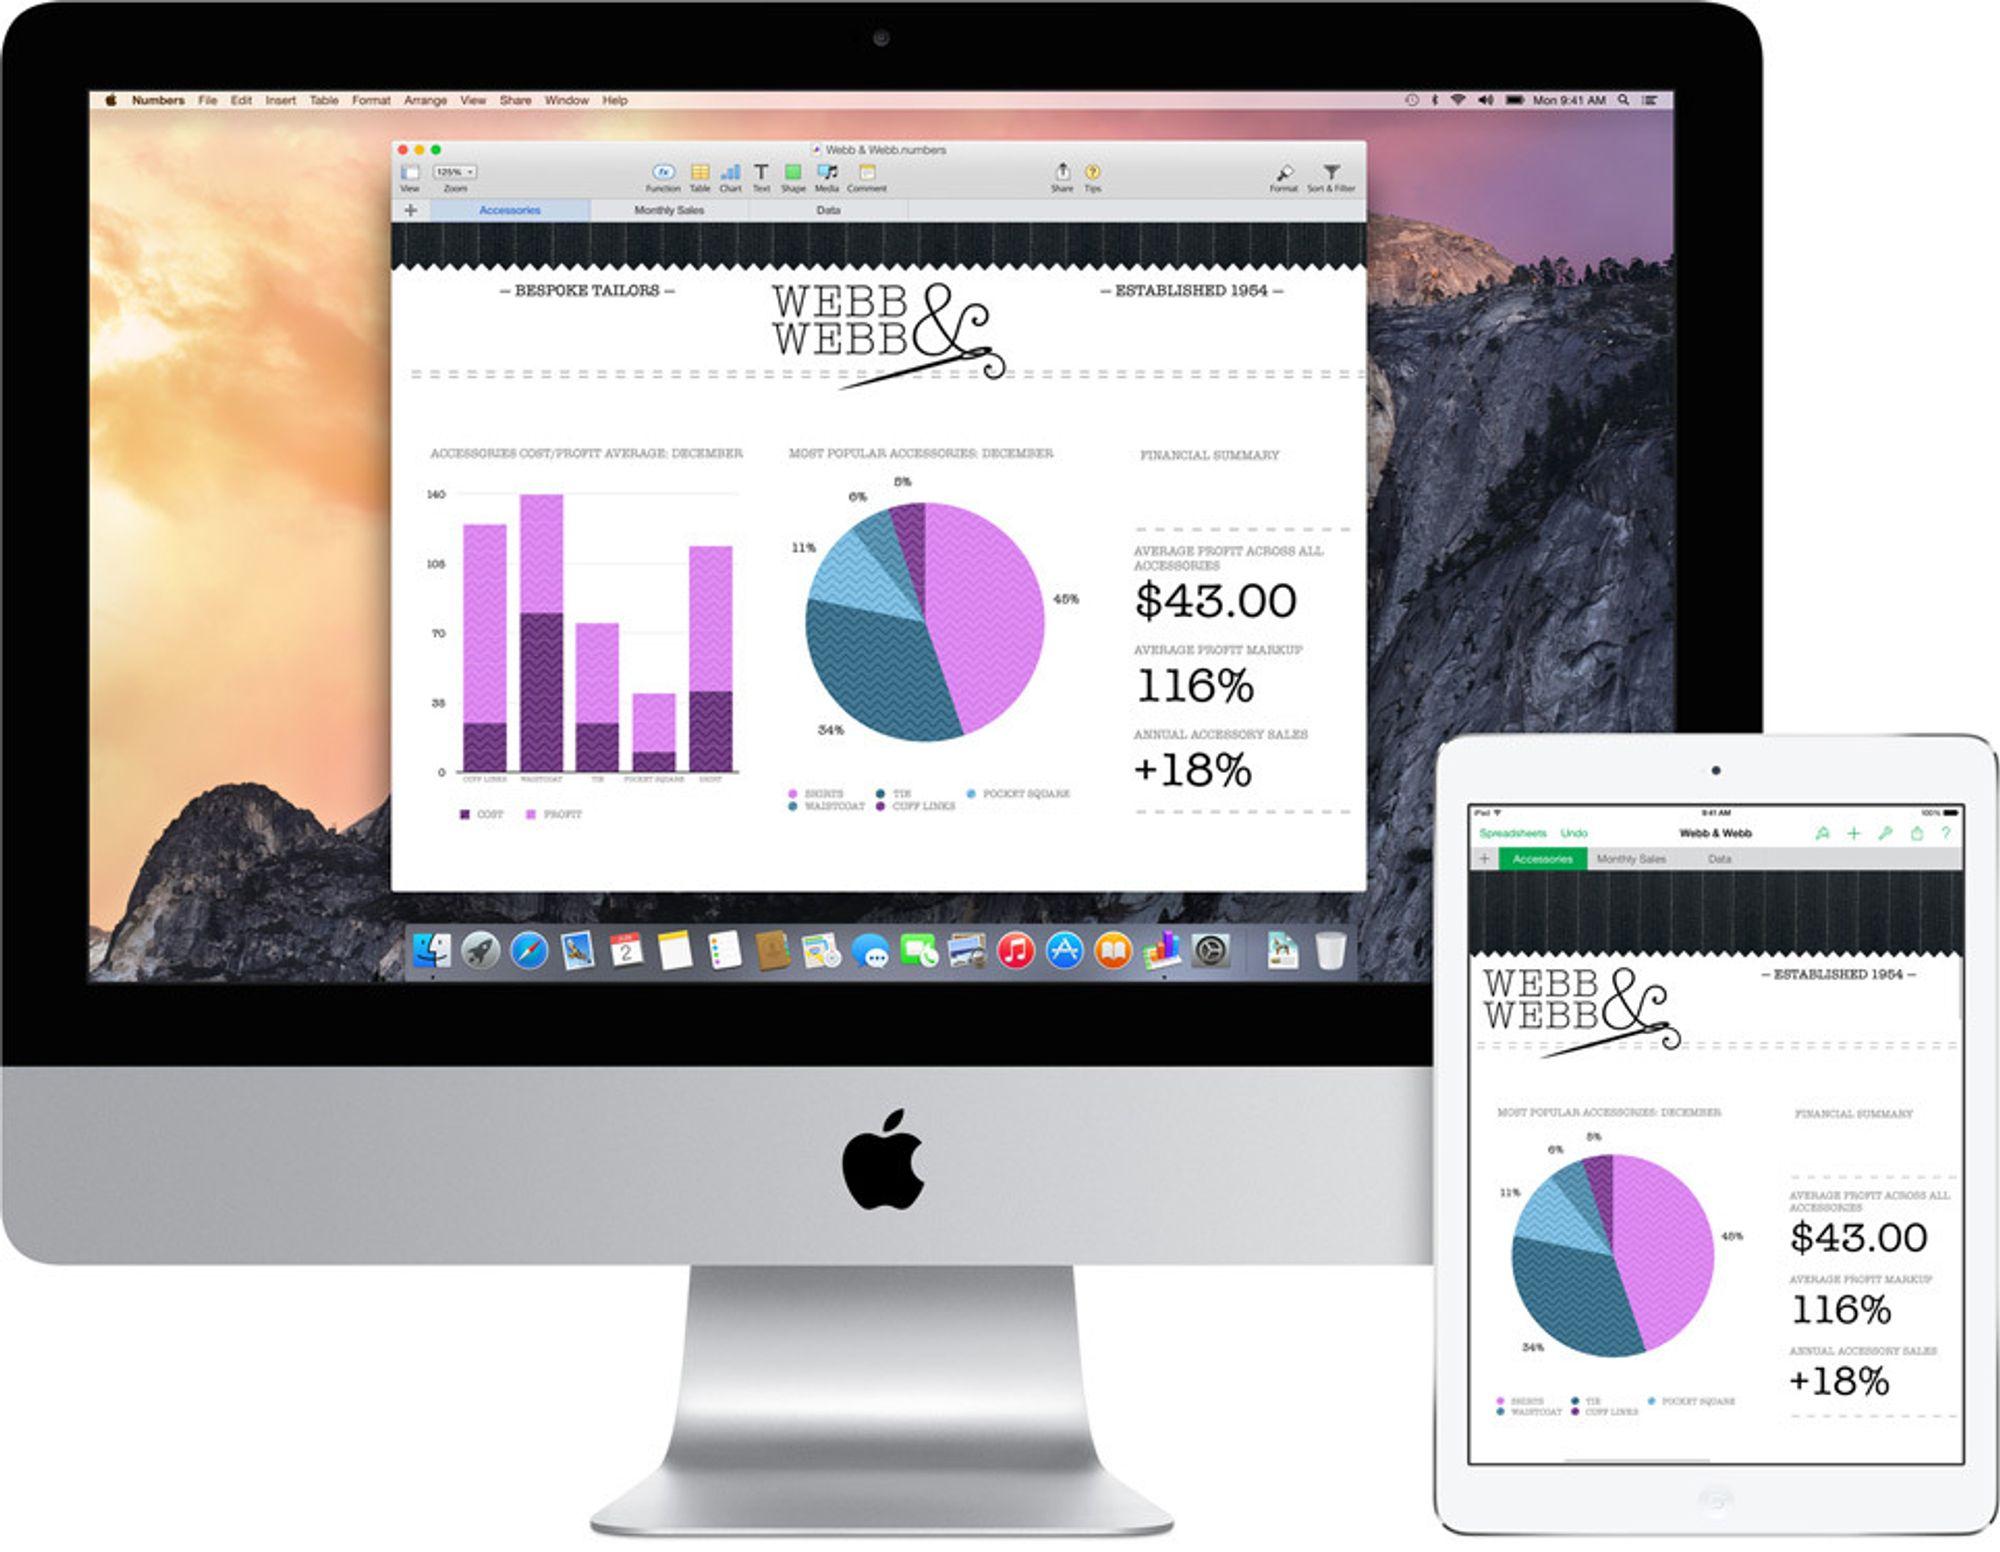 operativsystem mac